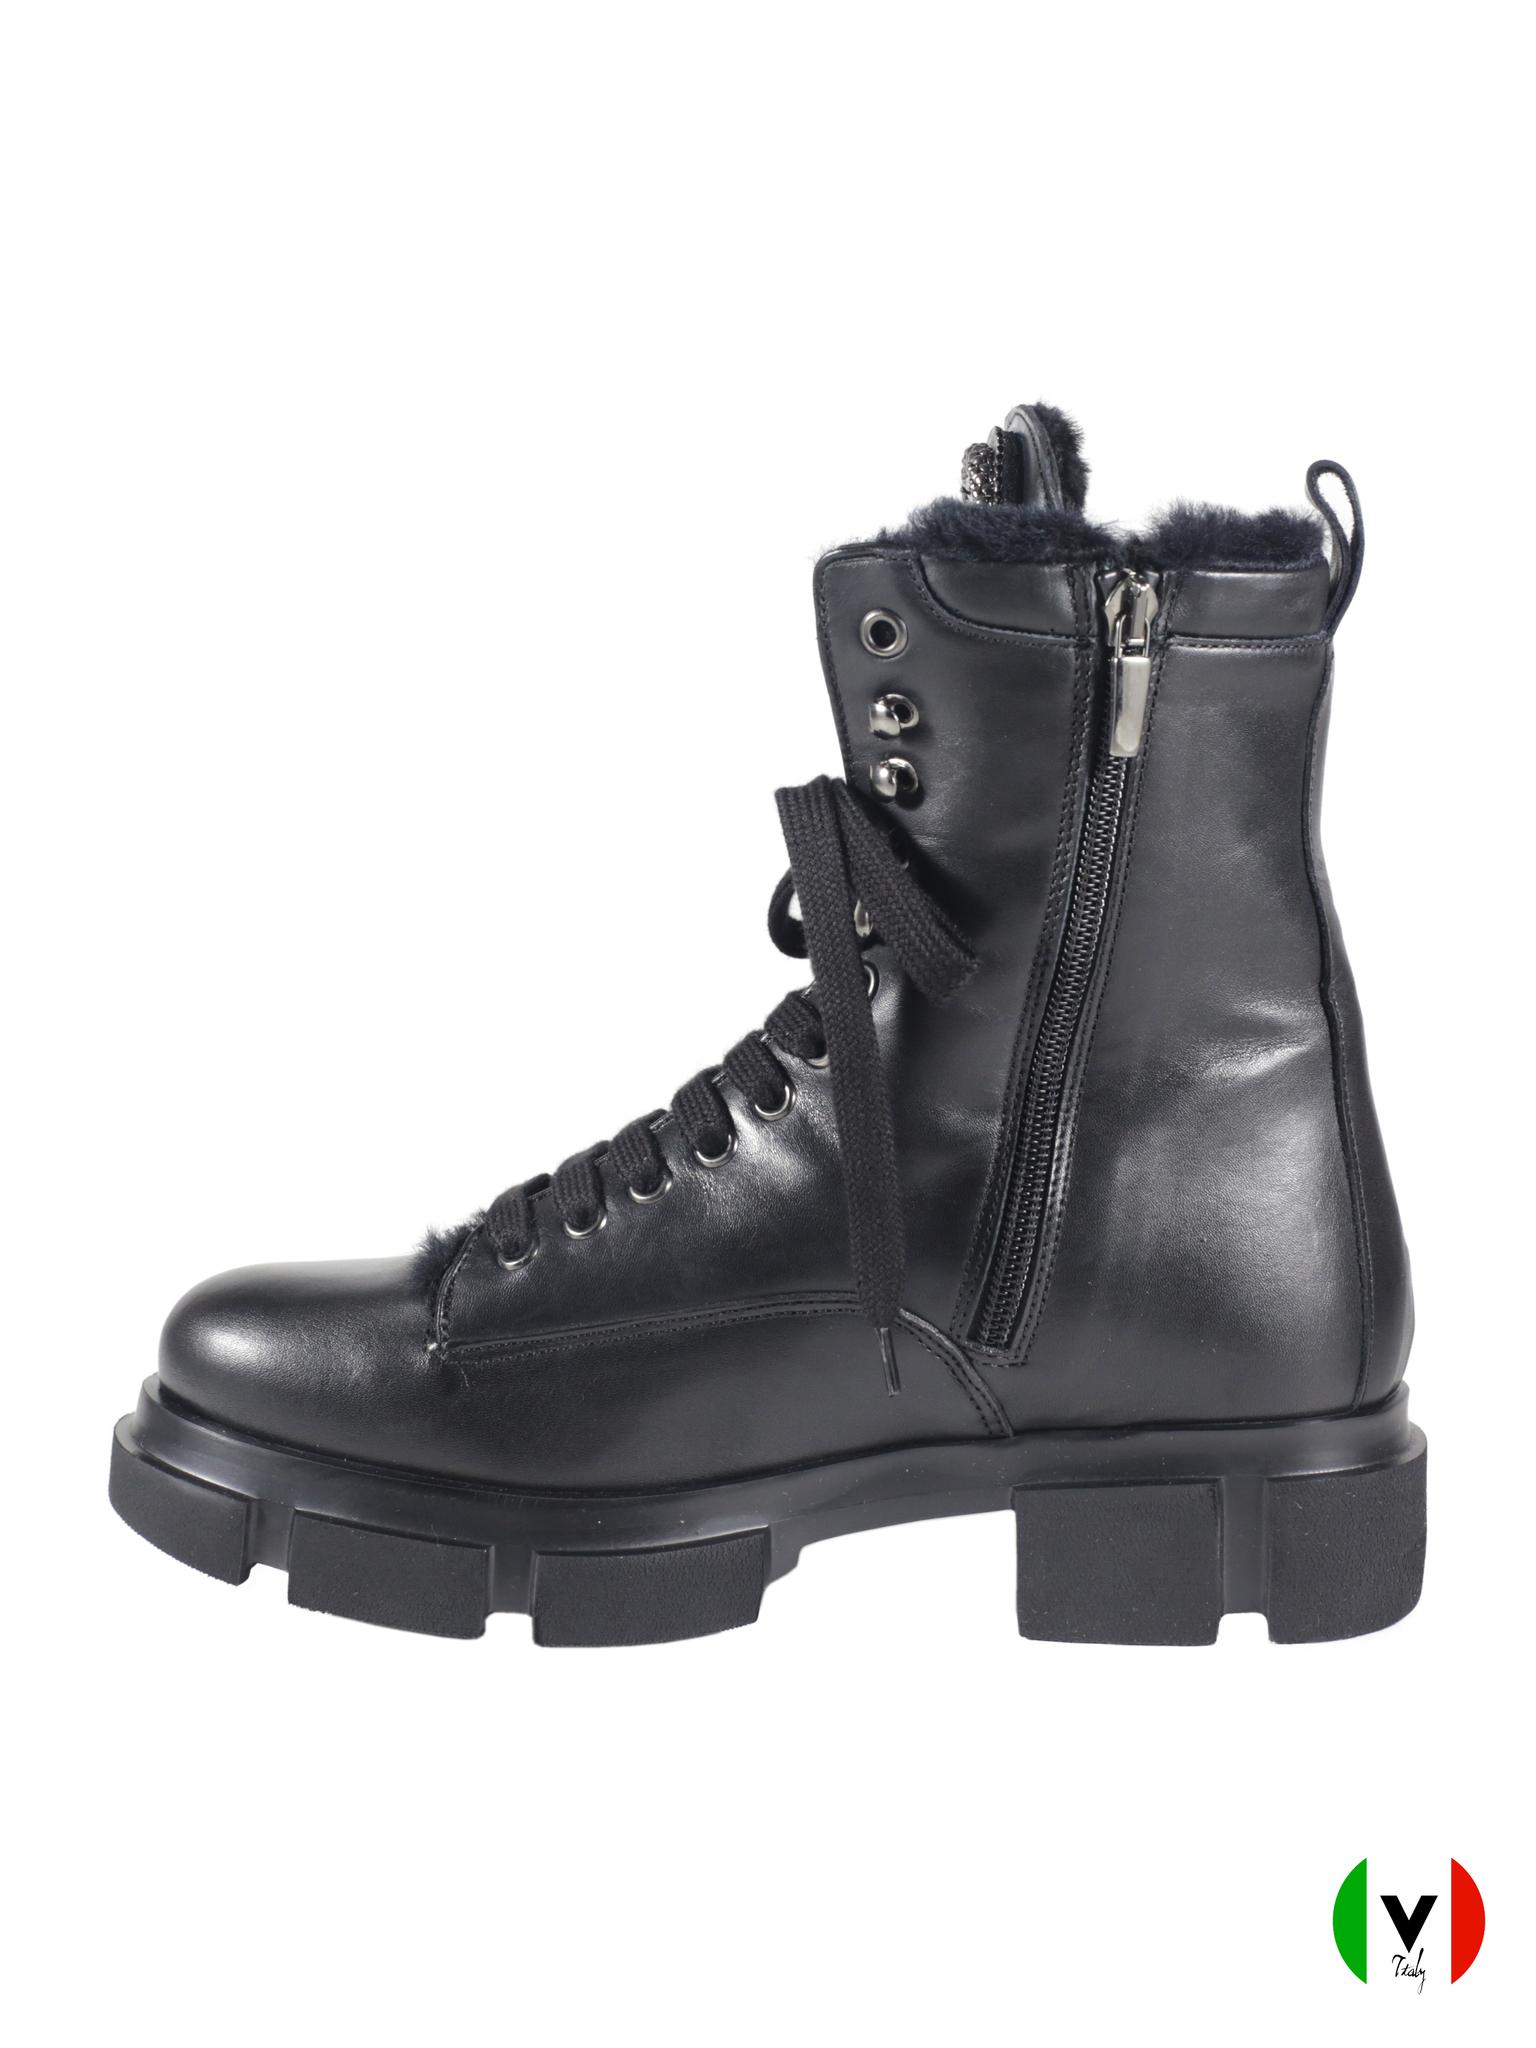 Зимние ботинки Laura Bellariva в стиле гранж 4081, артикул 4081, сезон зима, цвет чёрный, материал кожа, цена 17 500 руб., veroitaly.ru